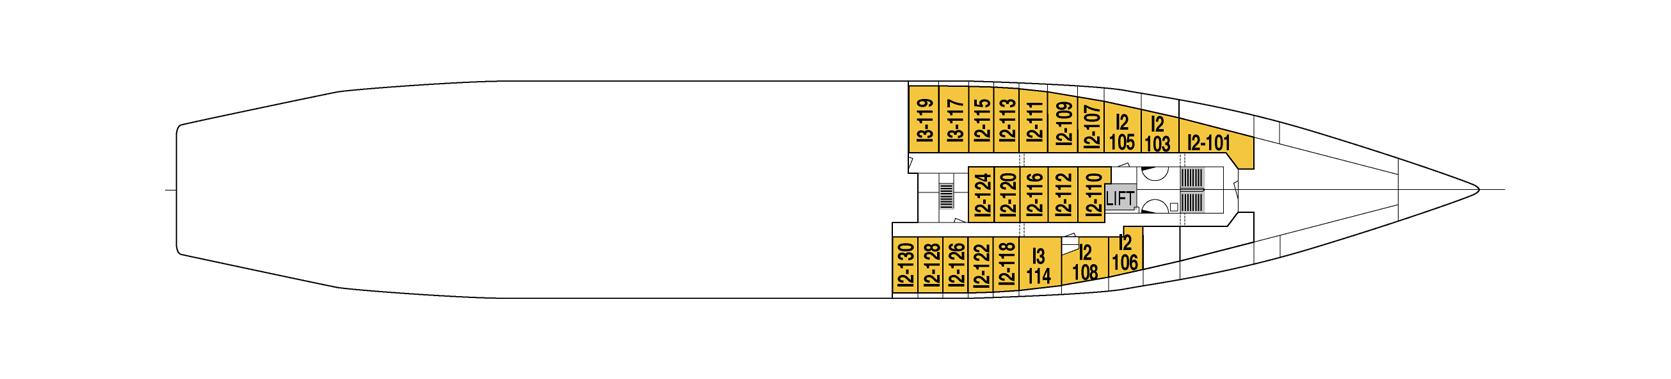 Hurtigruten MS Vesteralen Deck Plans Deck A.png